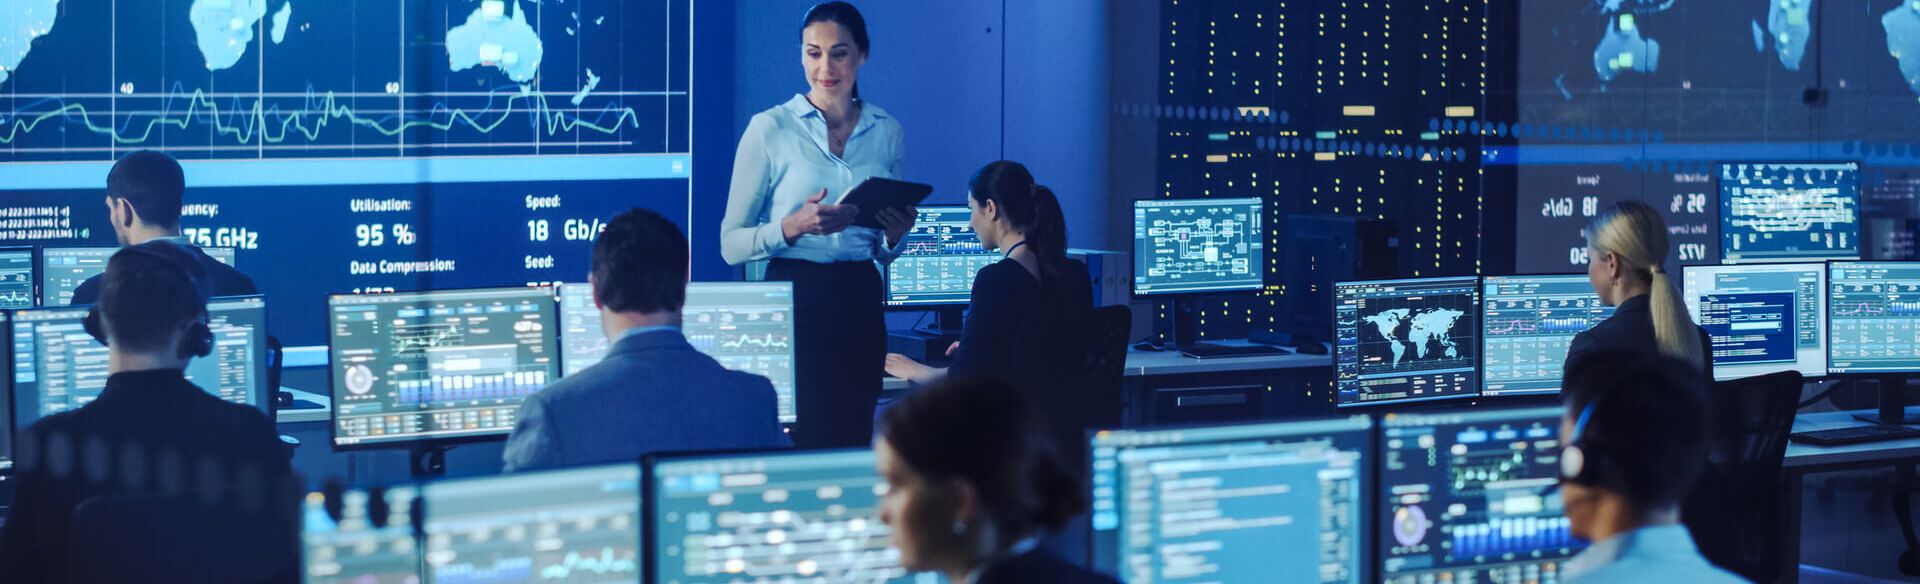 outsource it help desk tech support